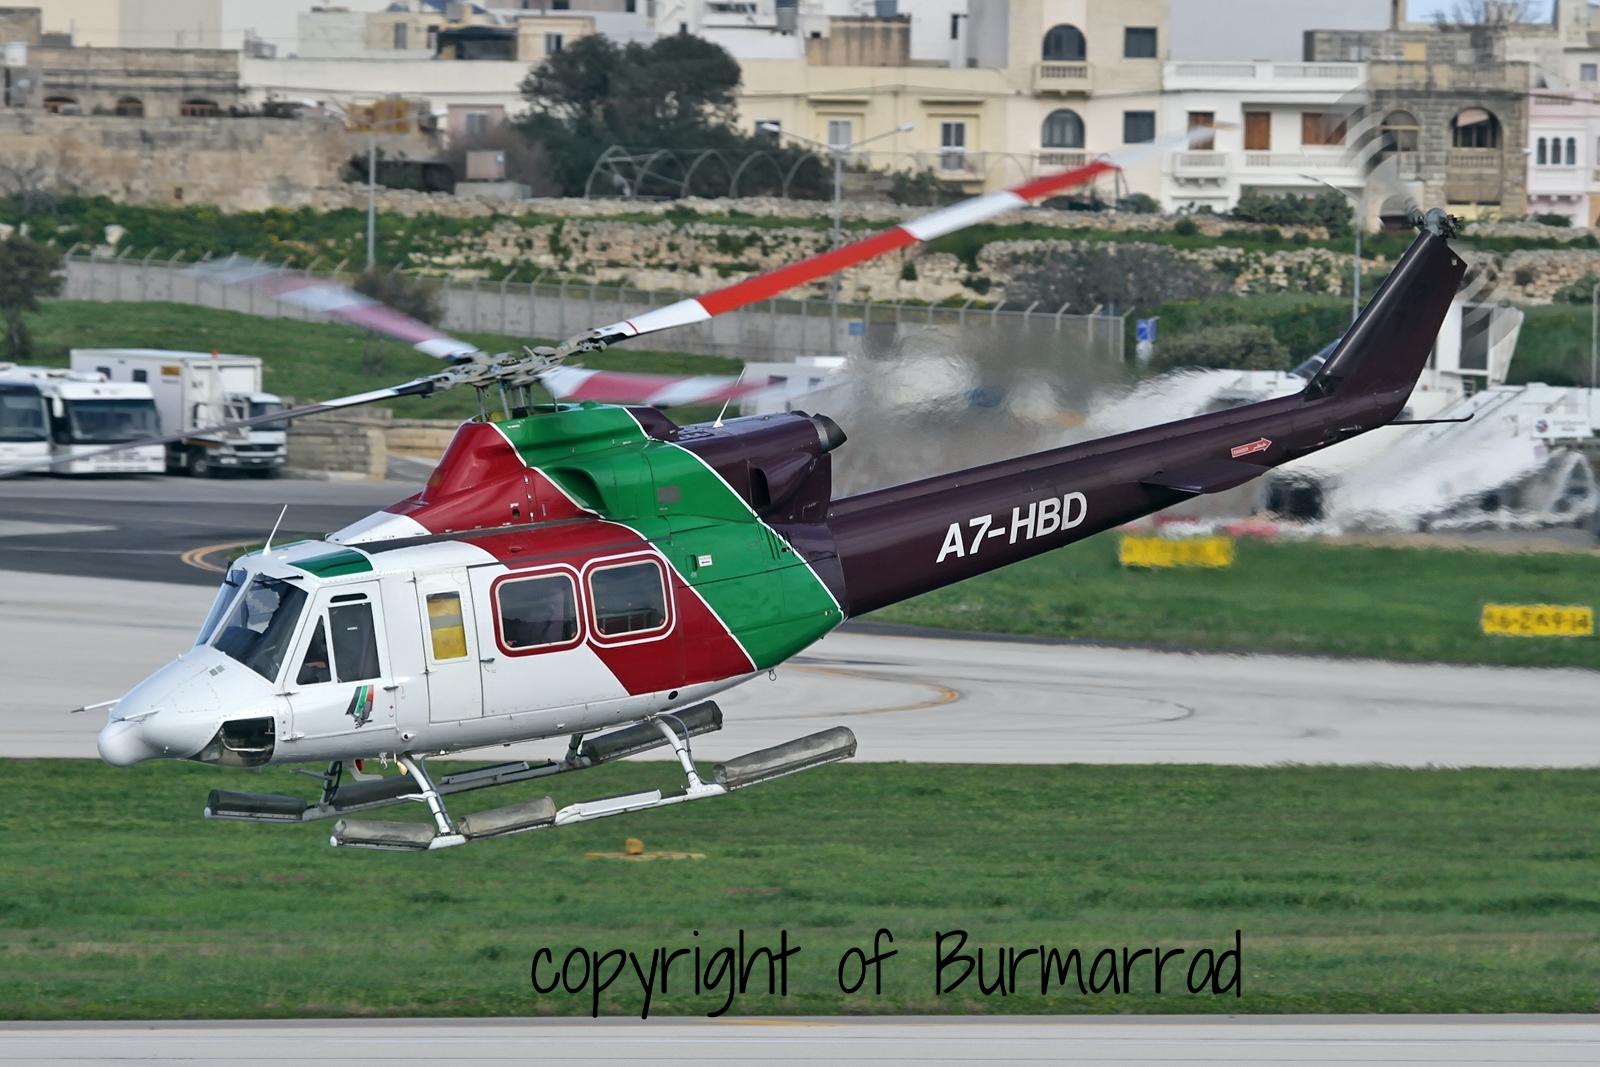 Elicottero 212 : Kit revell elicottero da montare bell ab uh n